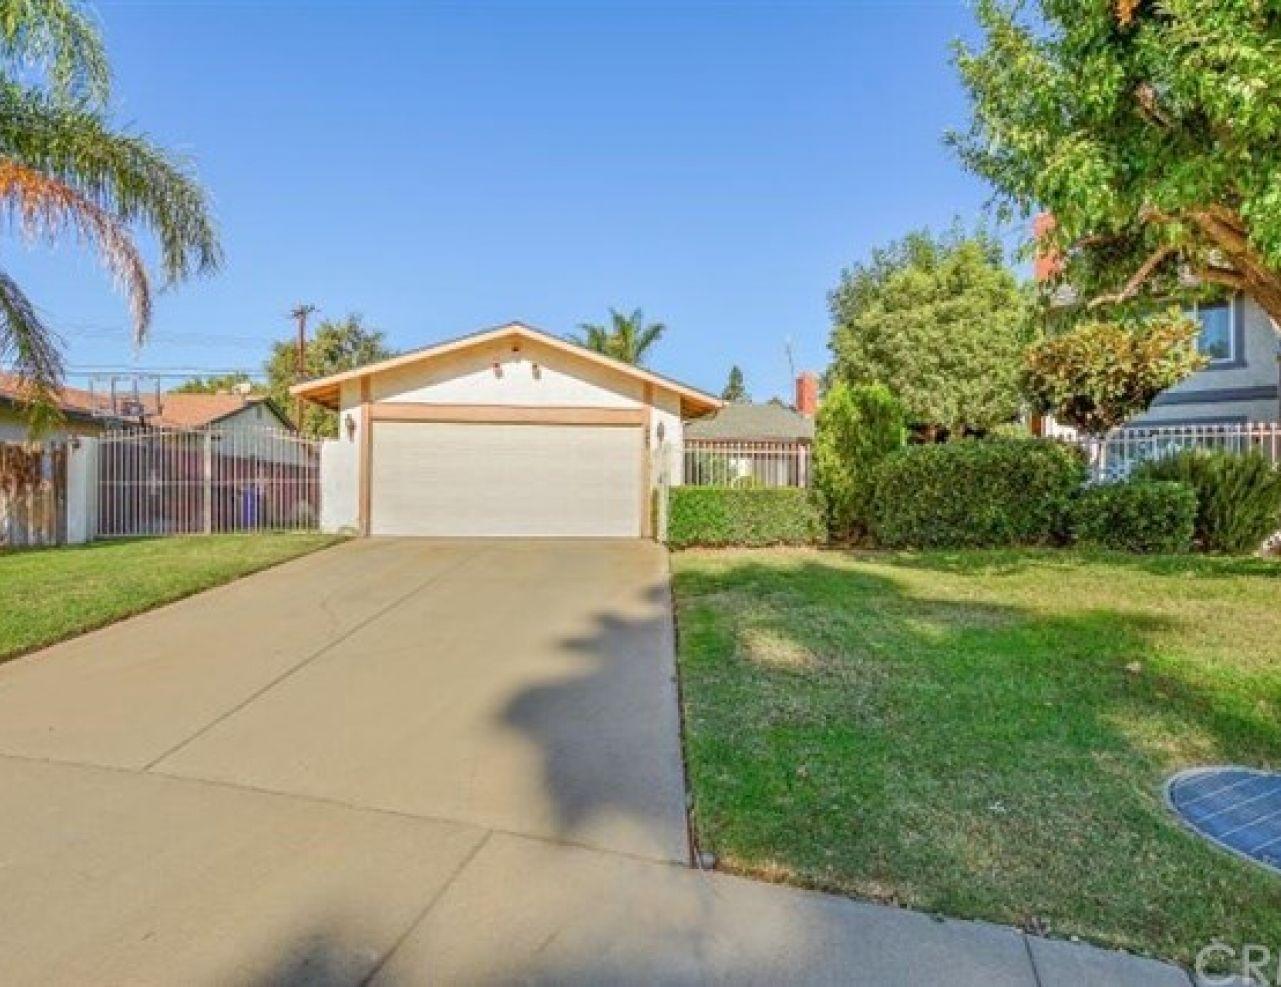 9916 Alpine Street, Rancho Cucamonga, CA 91730 Rancho